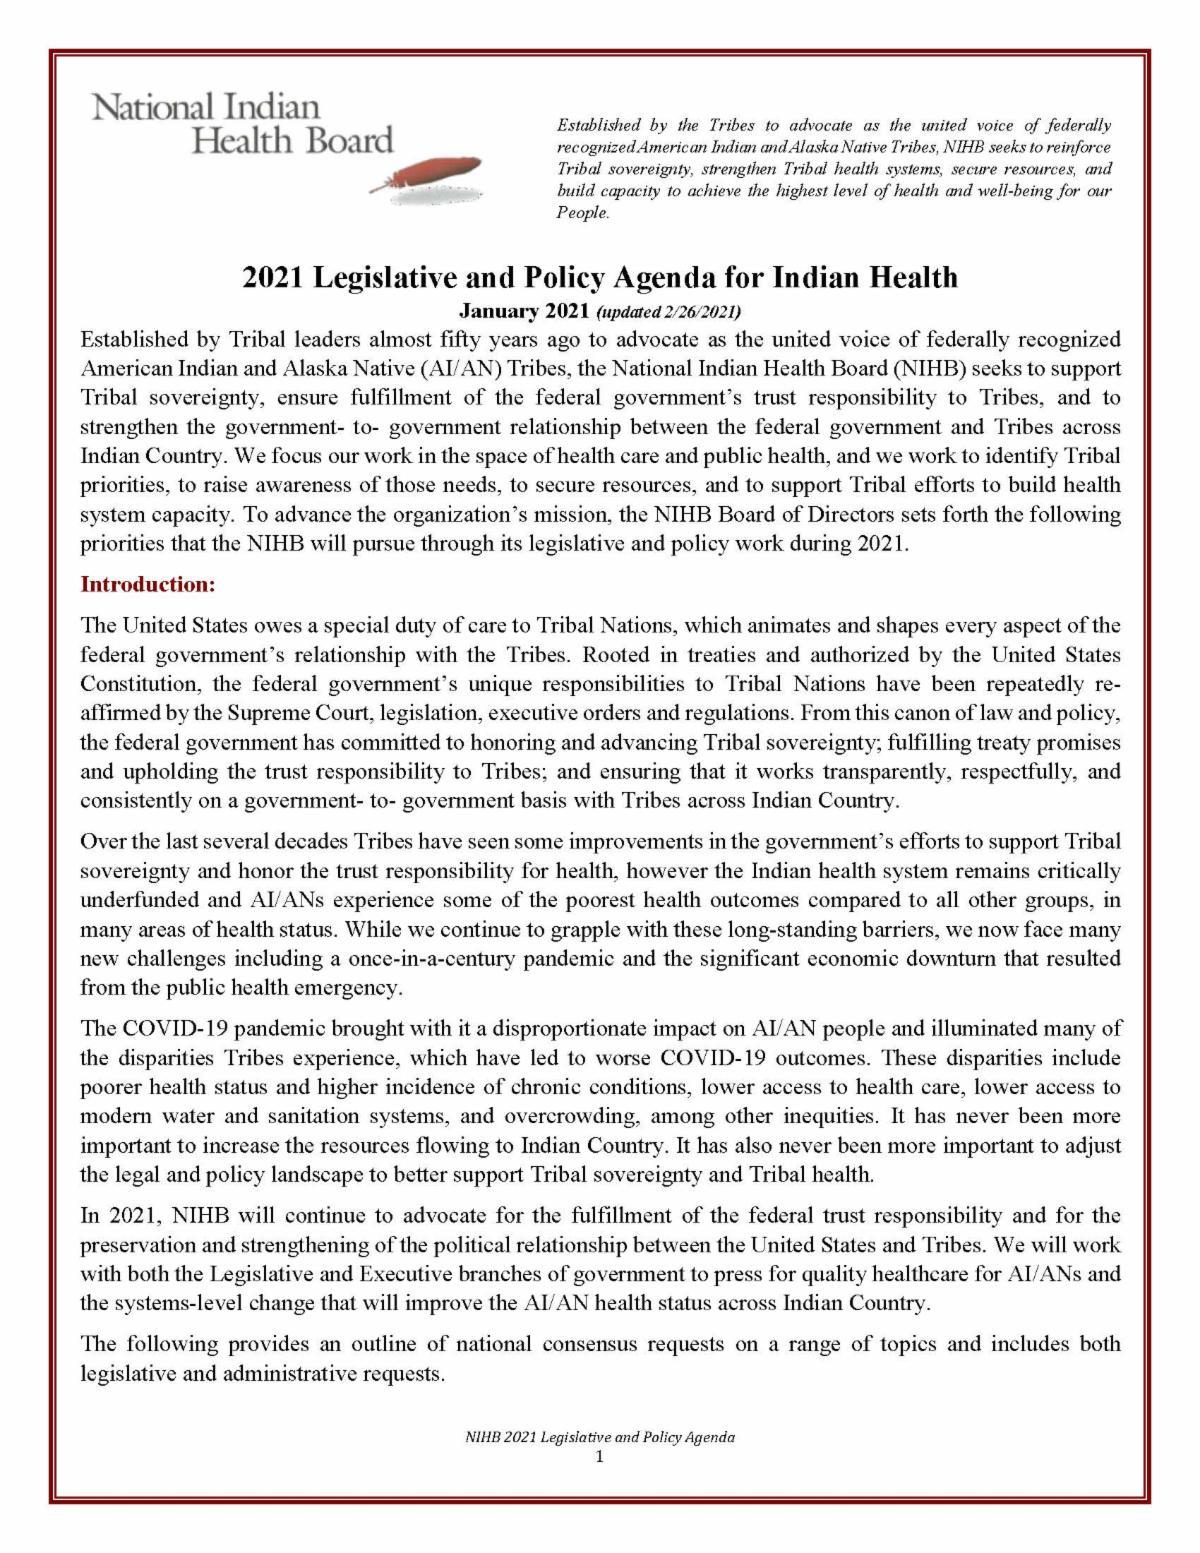 NIHB 2021 Leg-Policy Agenda